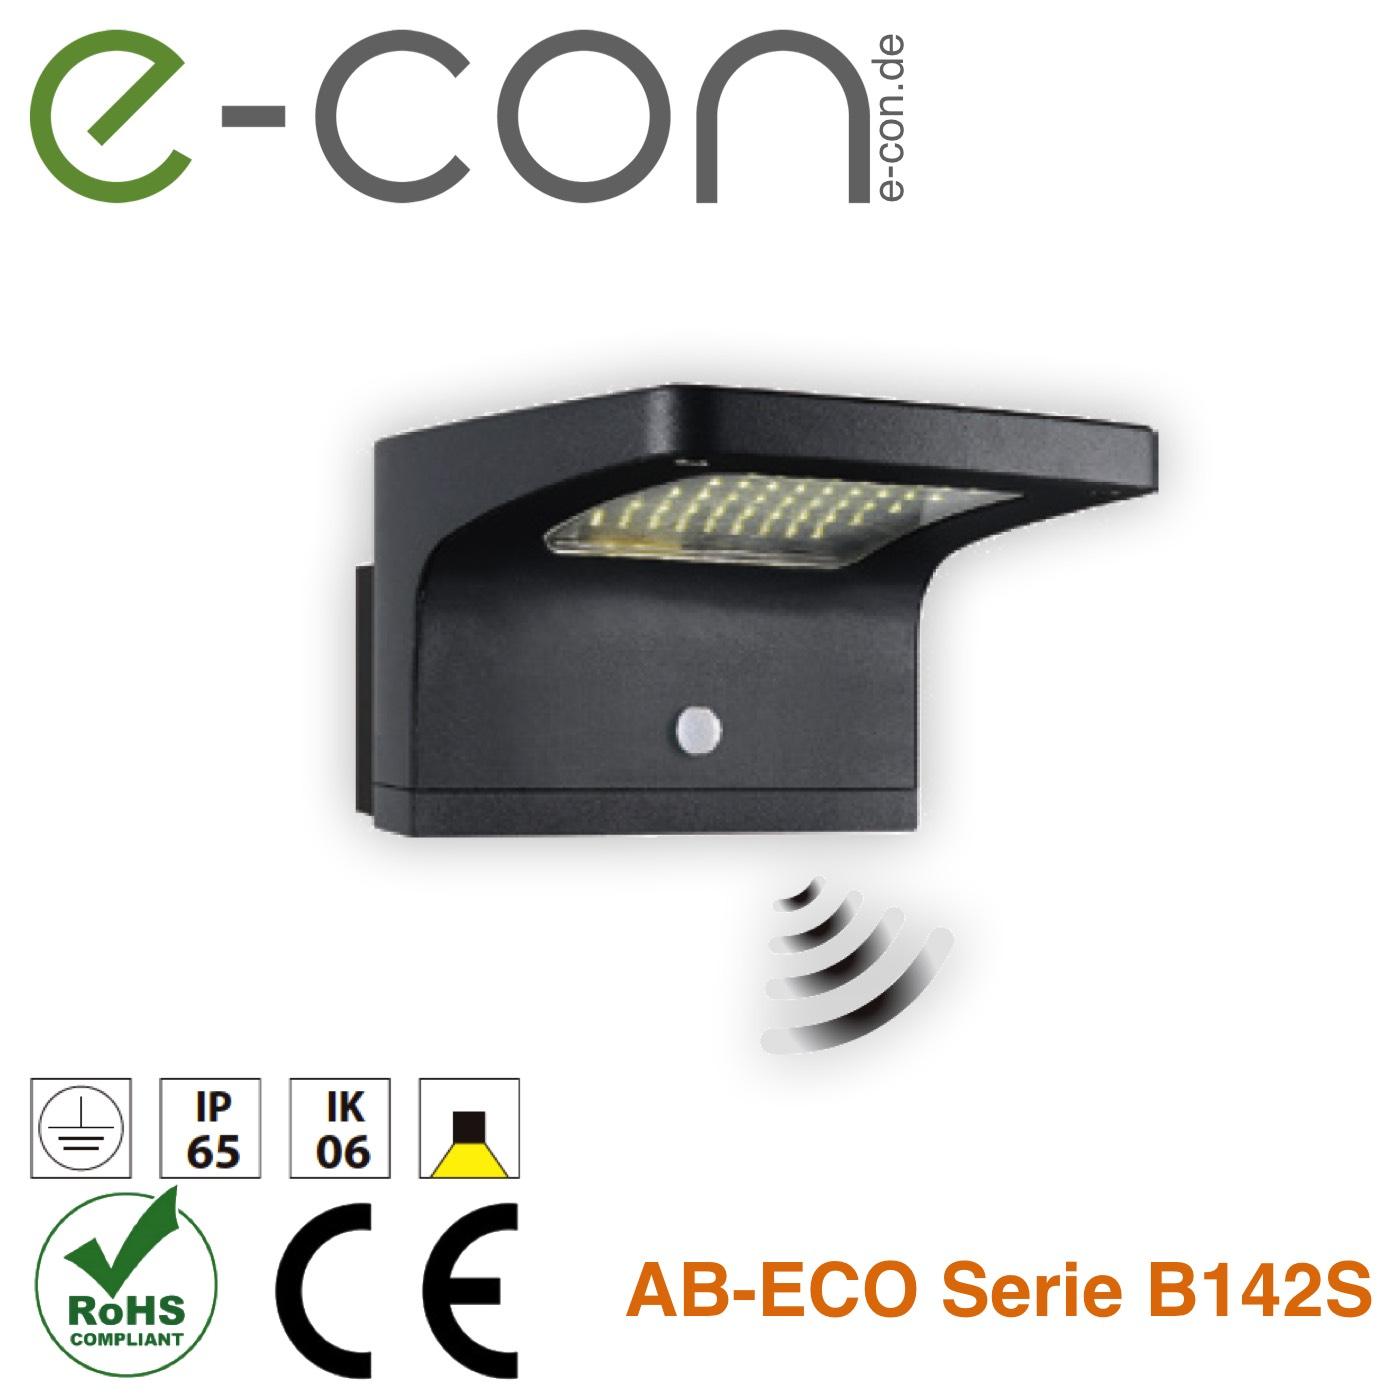 AB-ECO Serie B142S